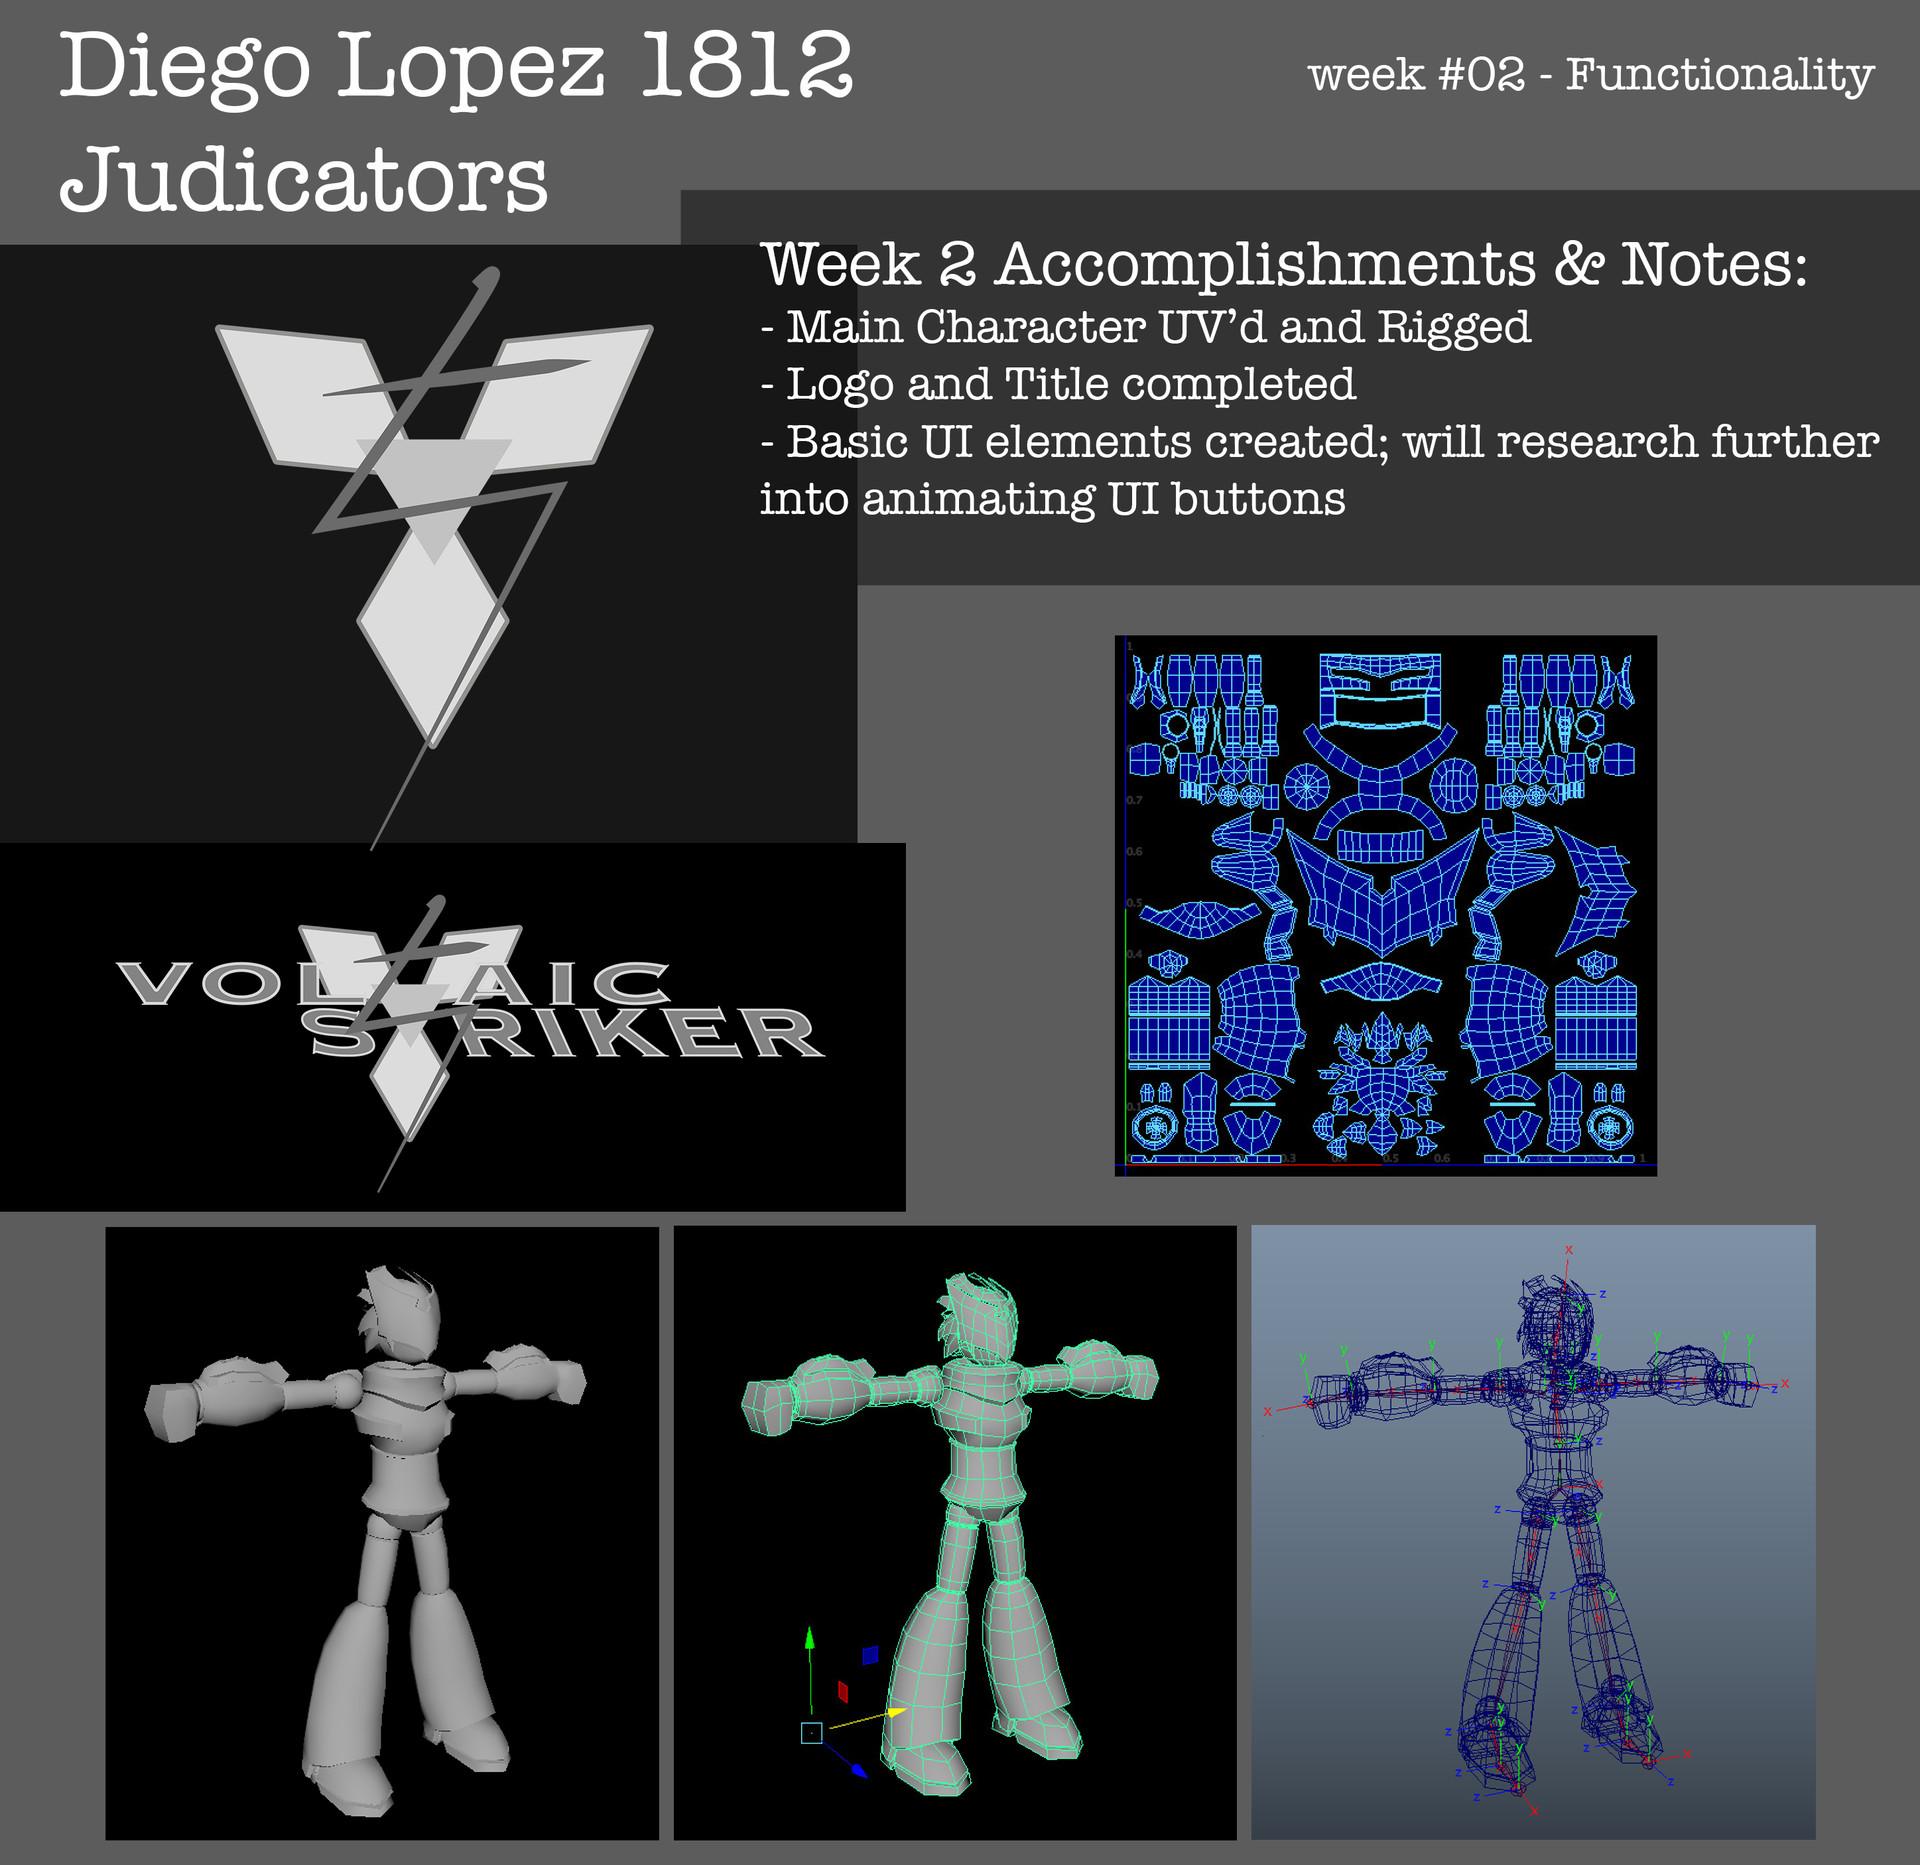 Diego sebastian reid lopez lopezd 1812 judicators wk2